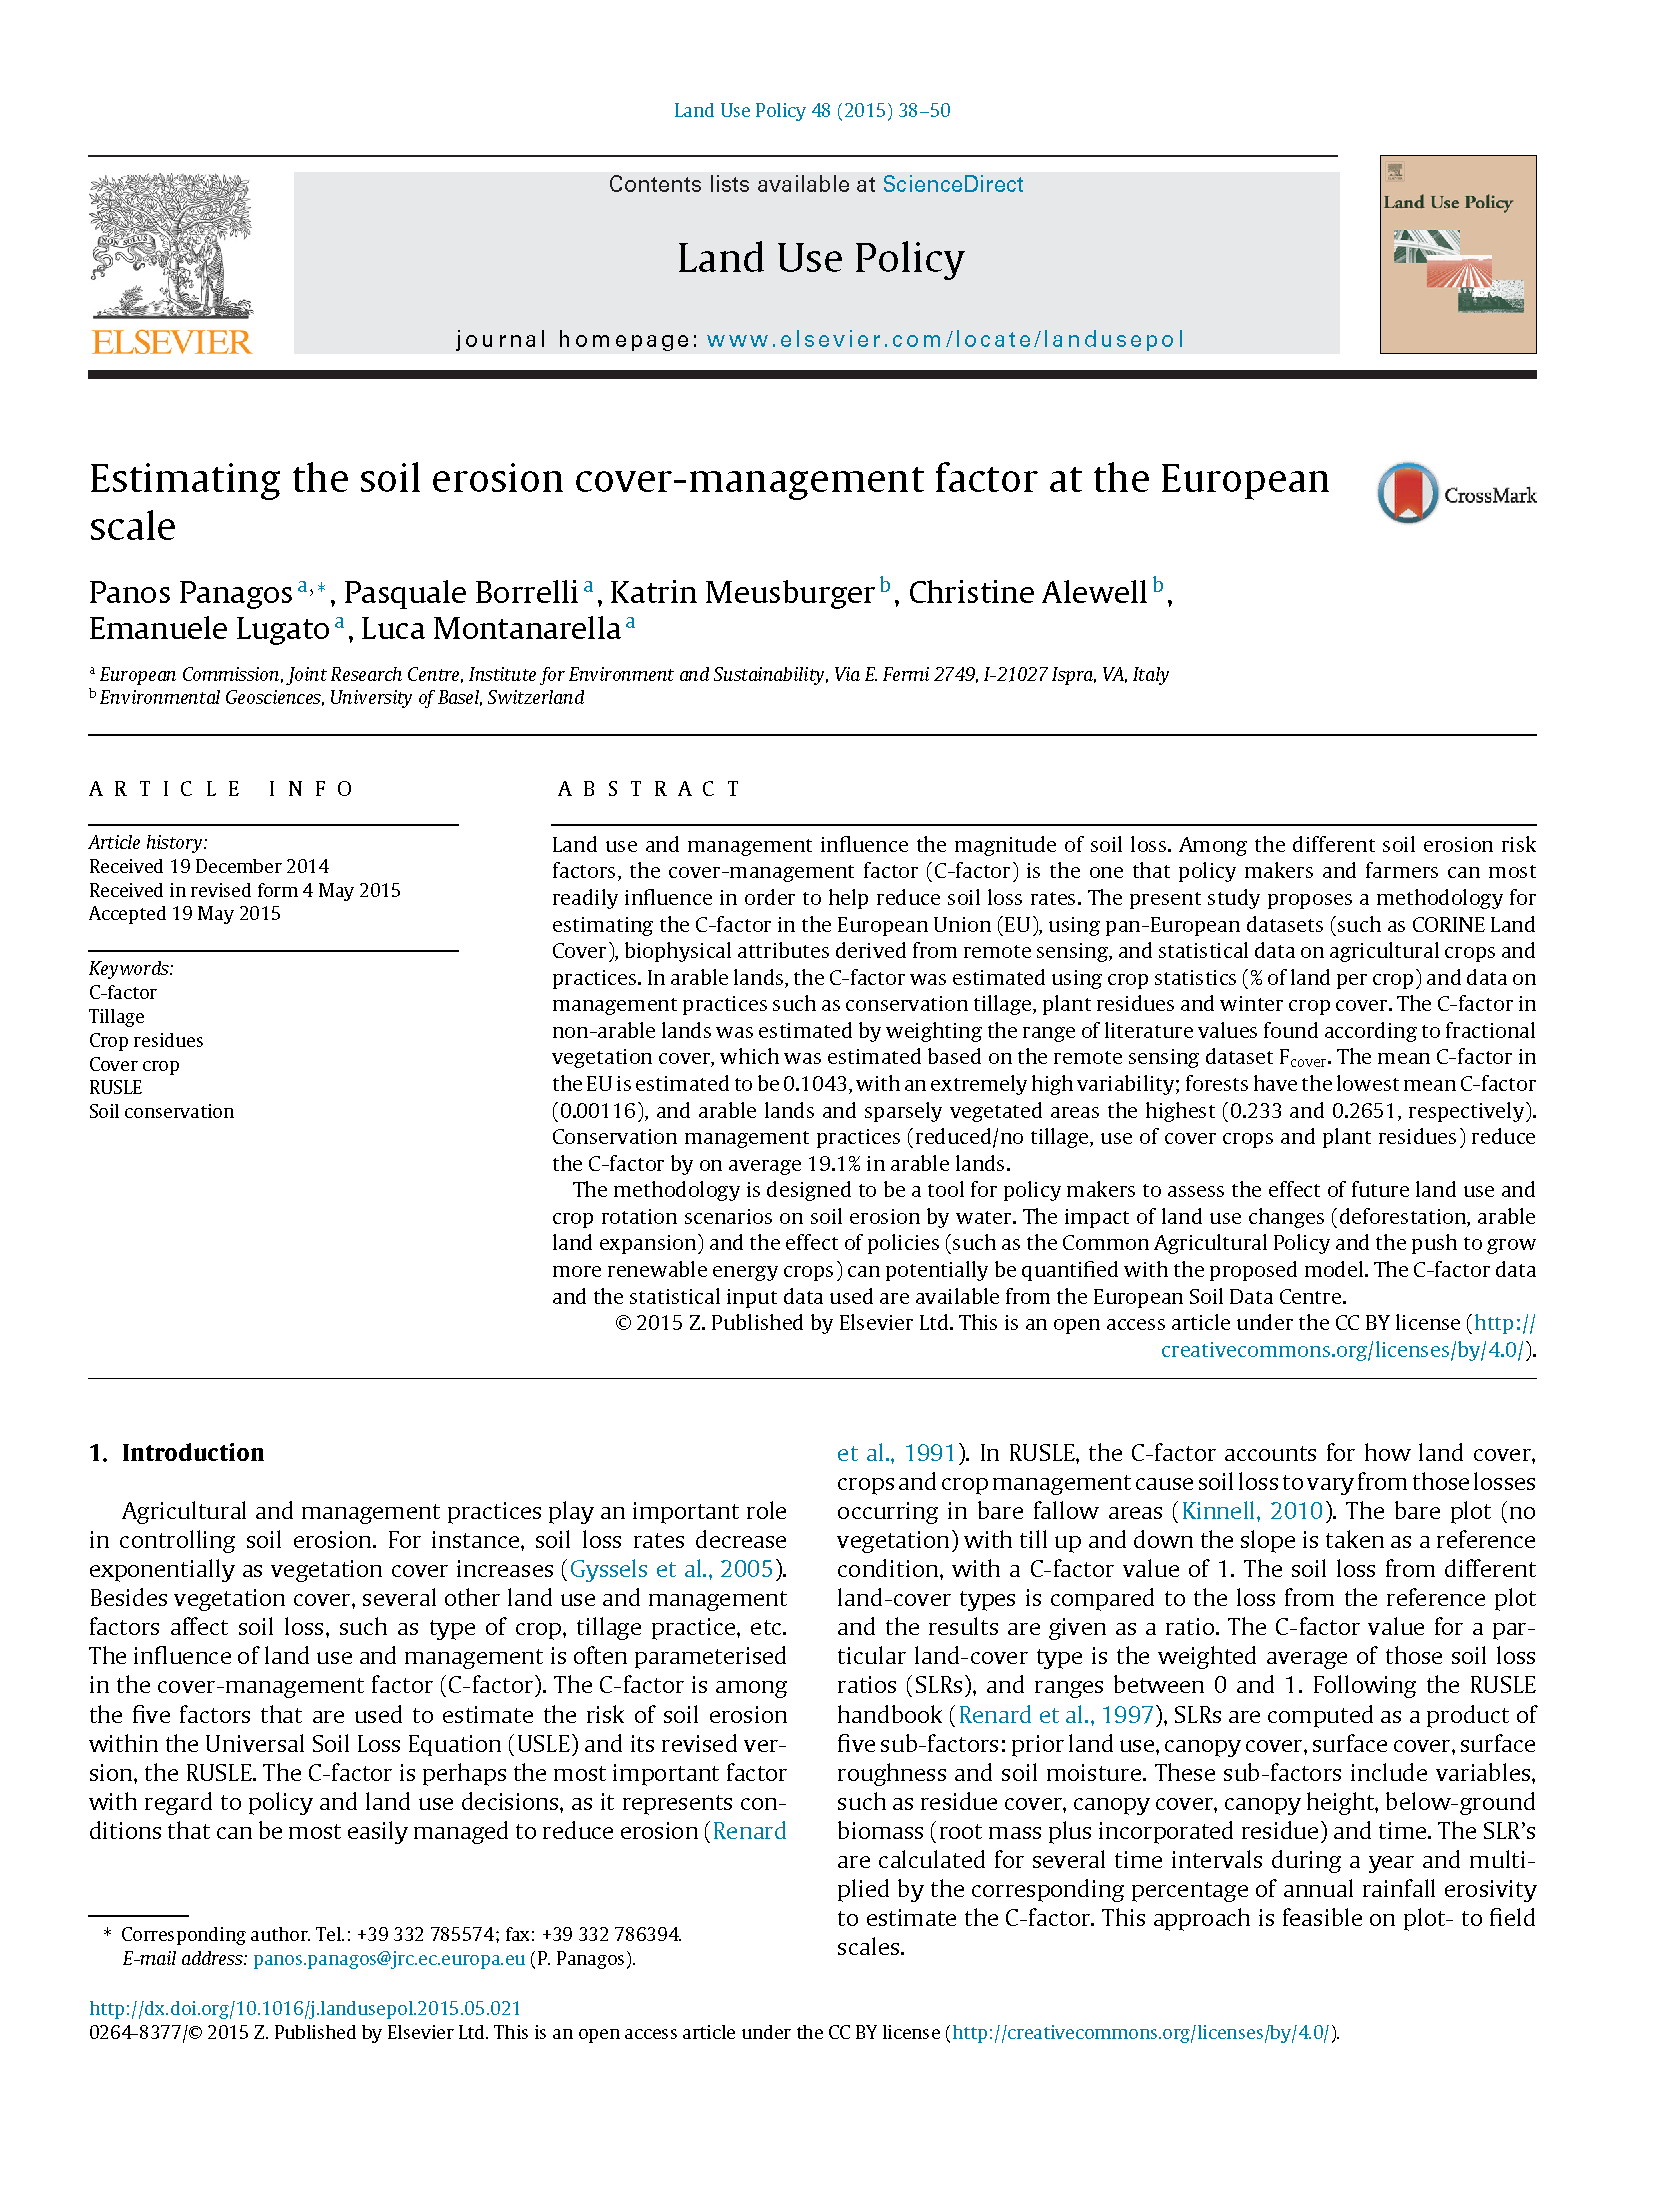 Private hospitals australia commission research paper